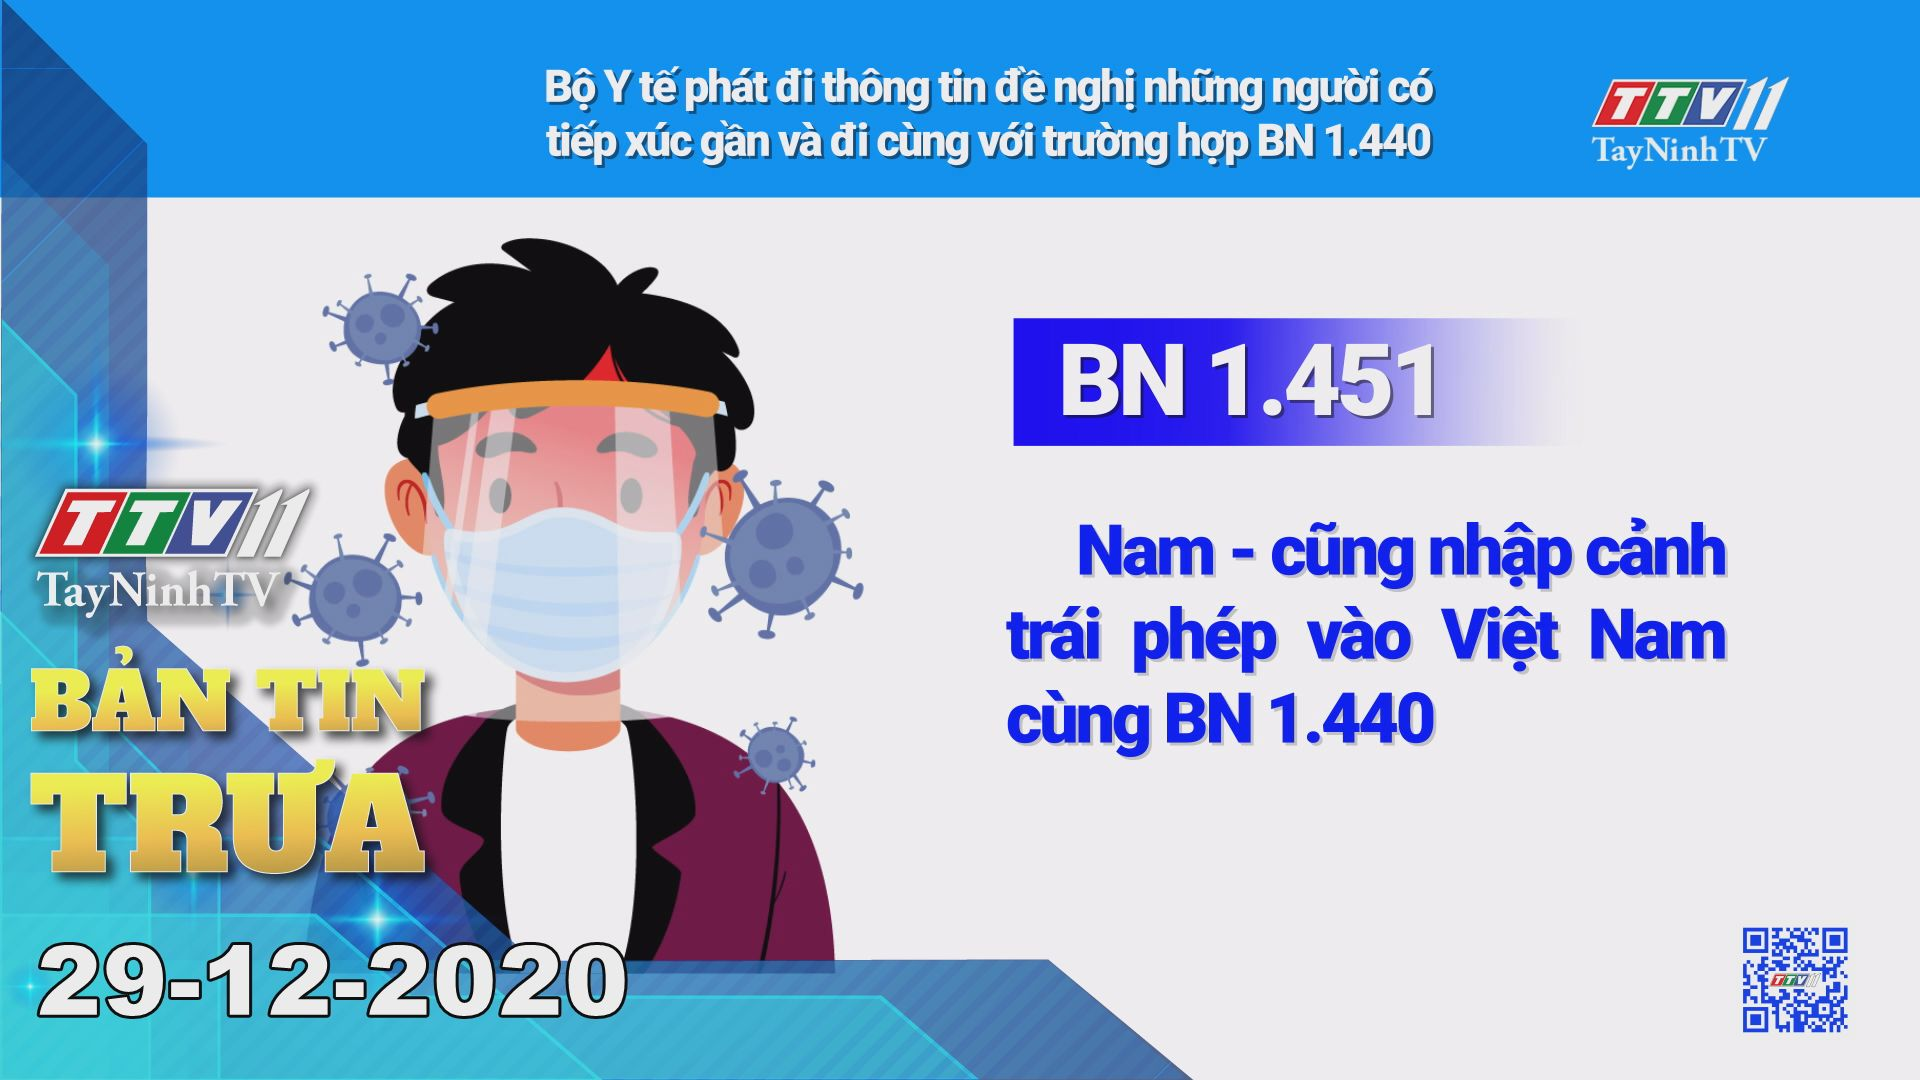 Bản tin trưa 29-12-2020 | Tin tức hôm nay | TayNinhTV